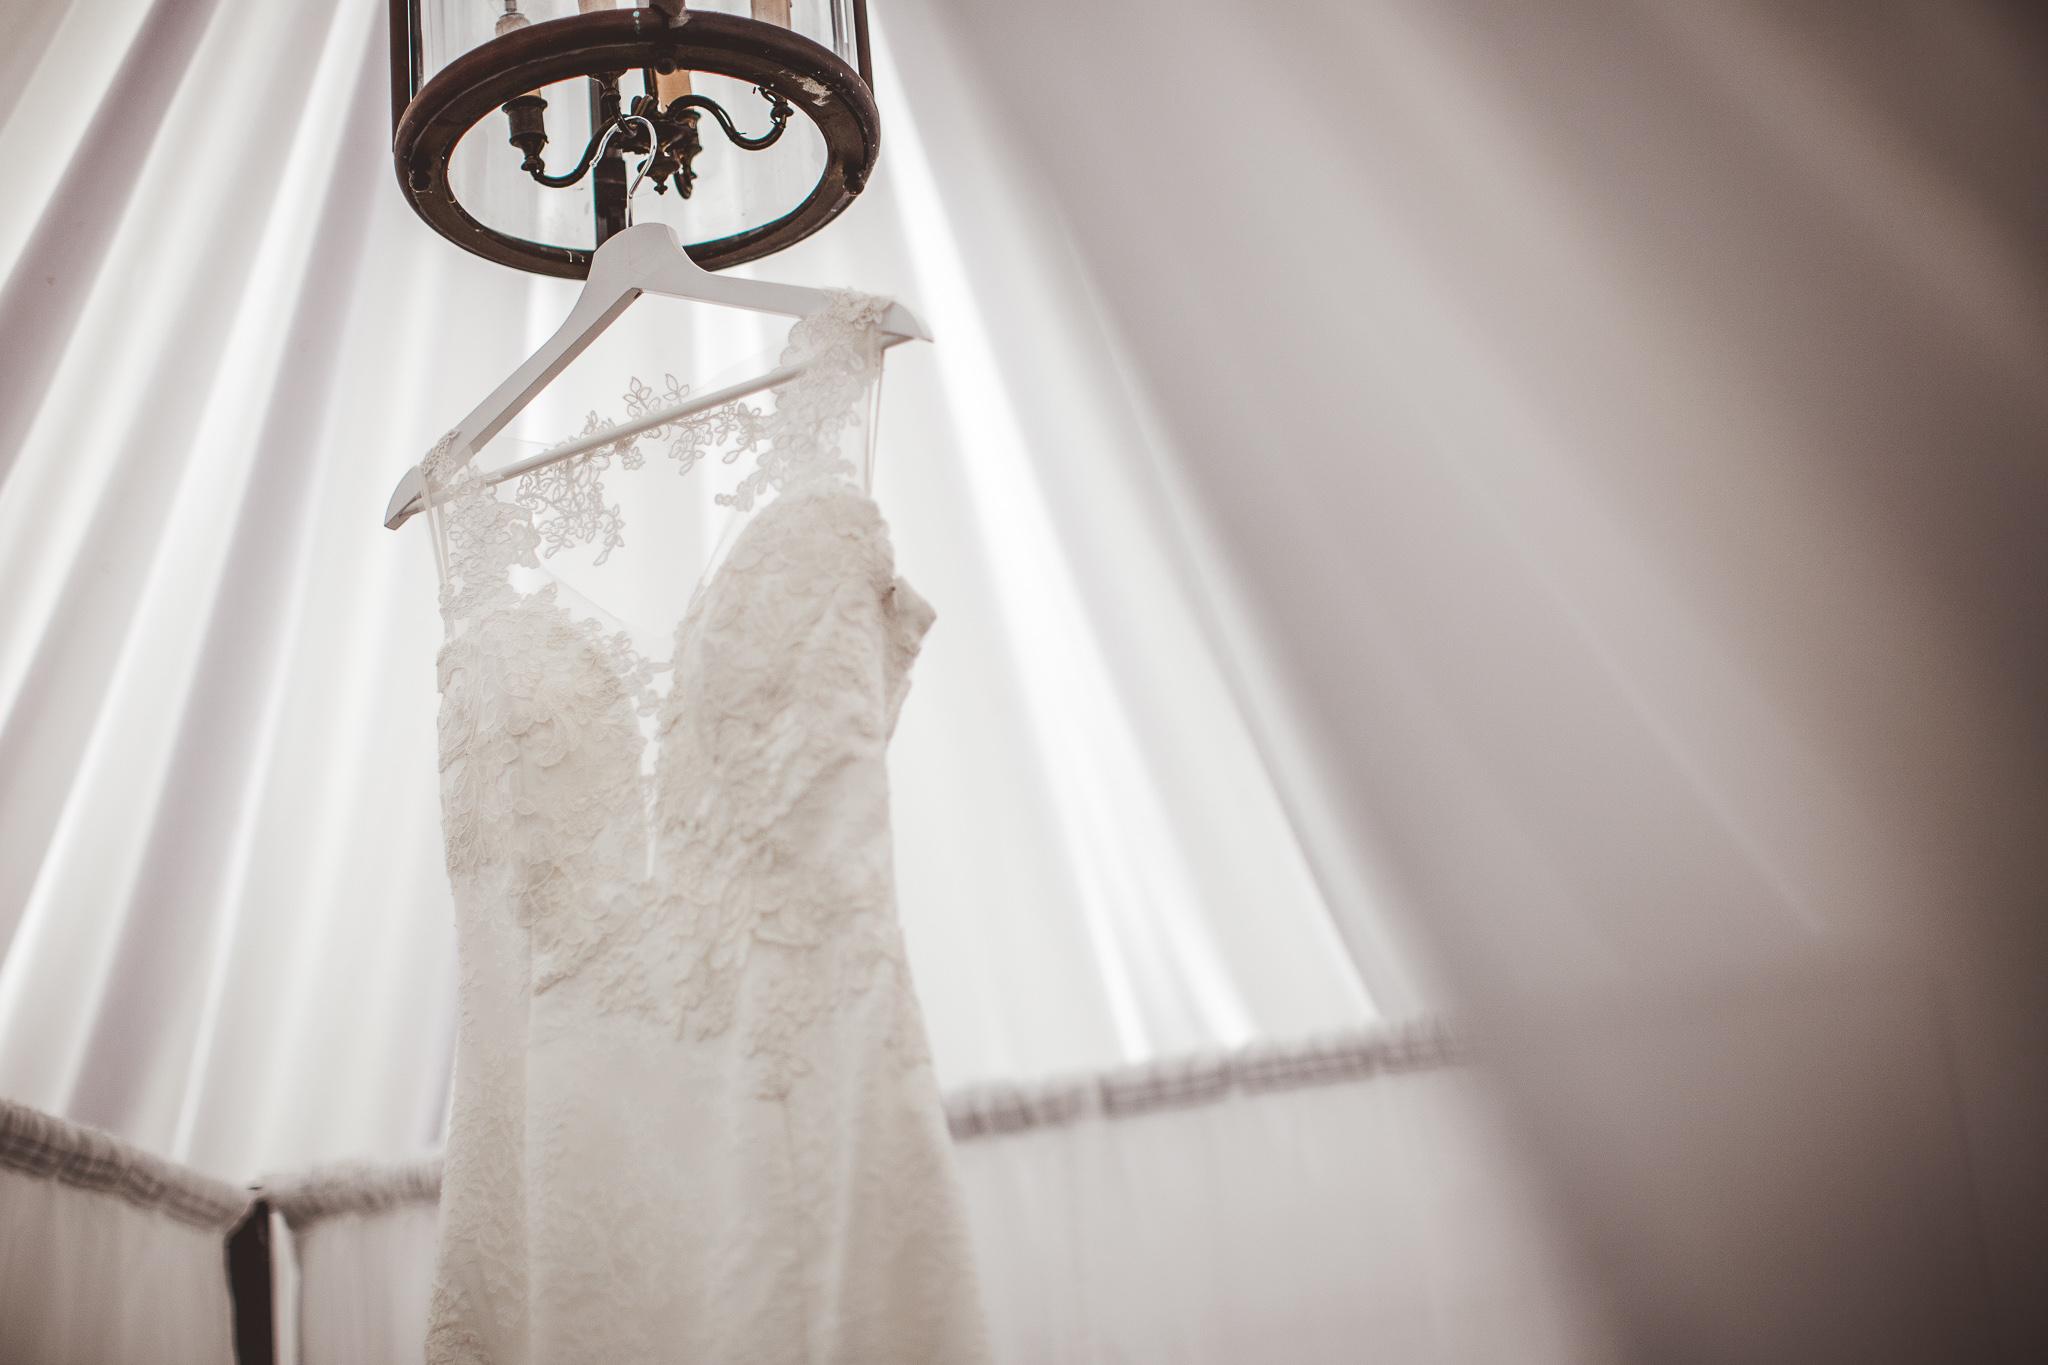 reportage mariage photo habillage preparatifs details robe la mariee domaine ronsac lodge toulouse